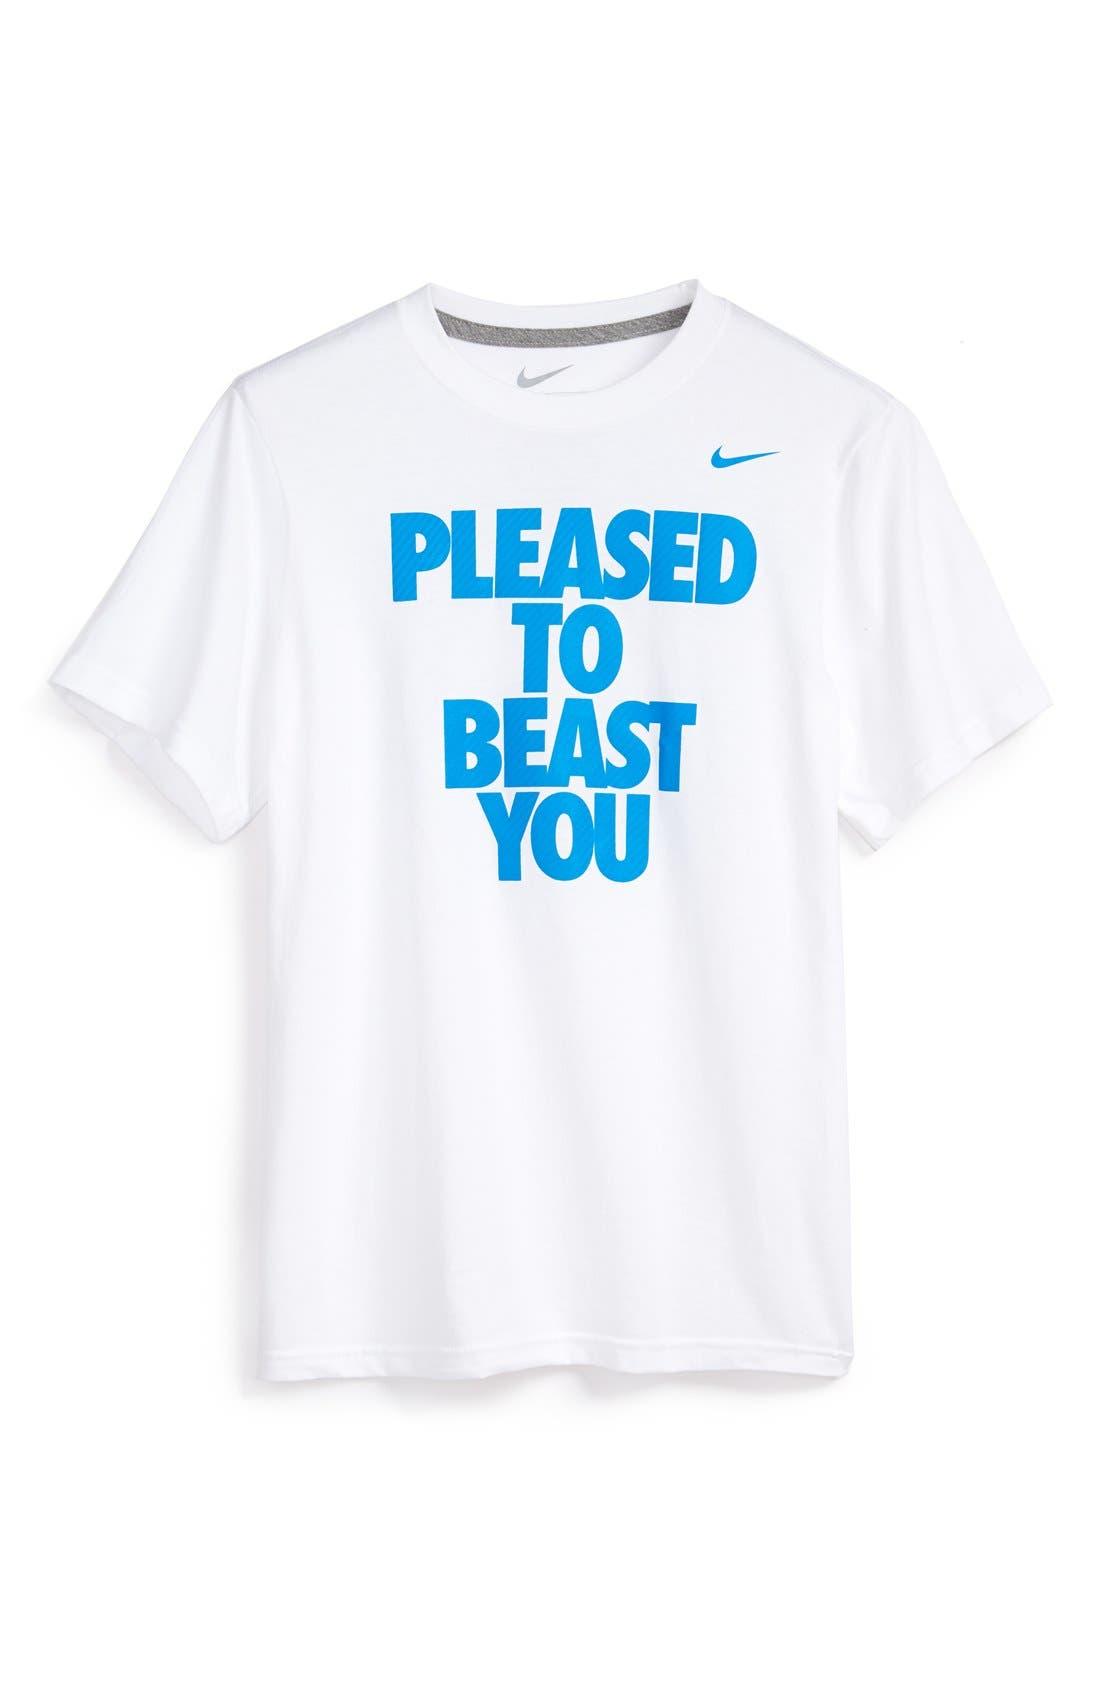 Main Image - Nike 'Pleased to Beast You' Short Sleeve Cotton T-Shirt (Big Boys)